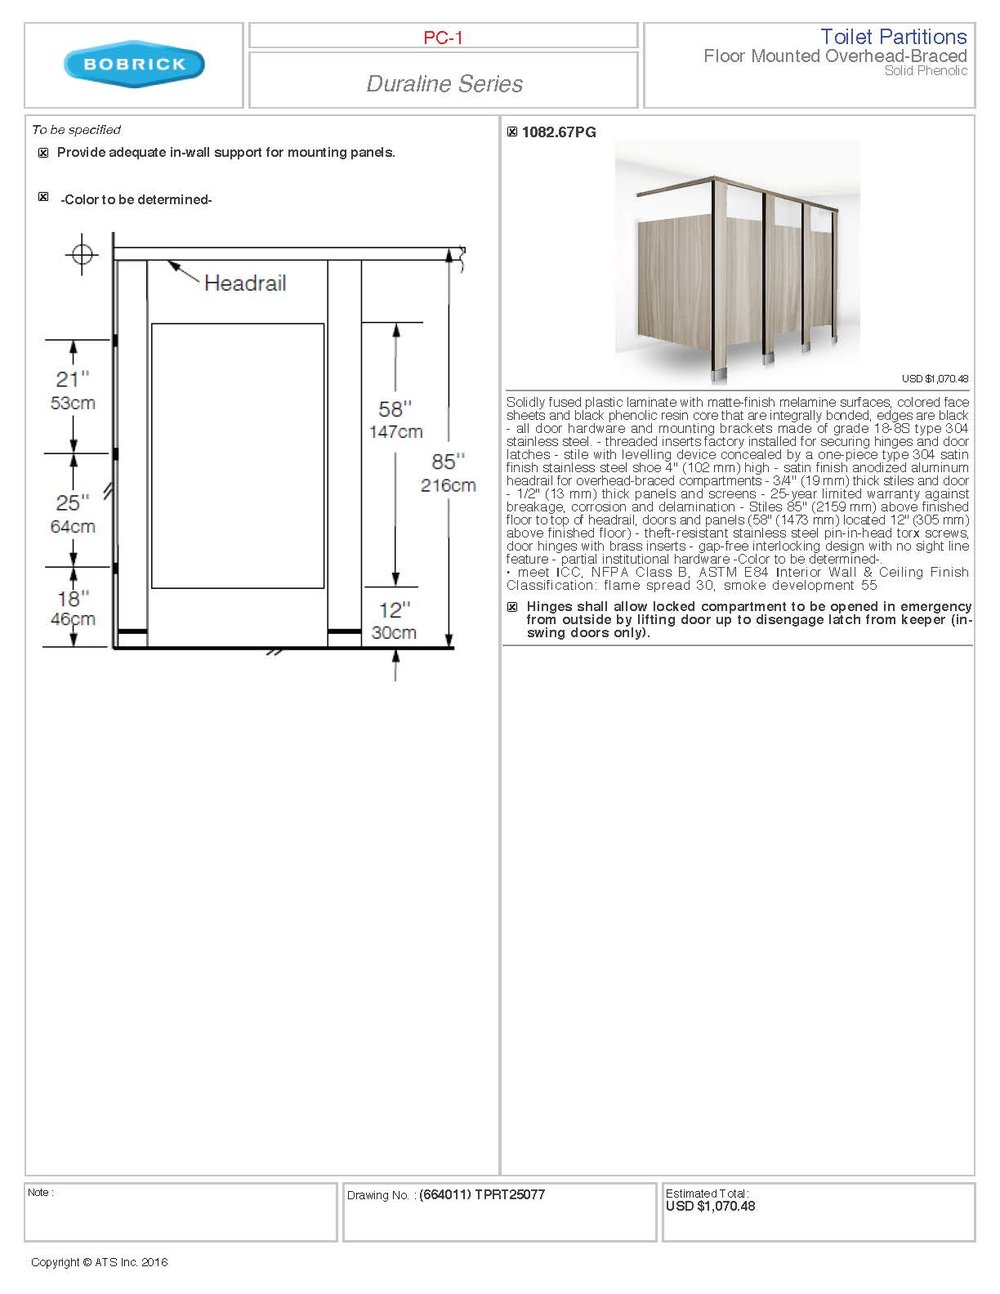 Pharmaceutical Building Cutsheets_Page_02.jpg